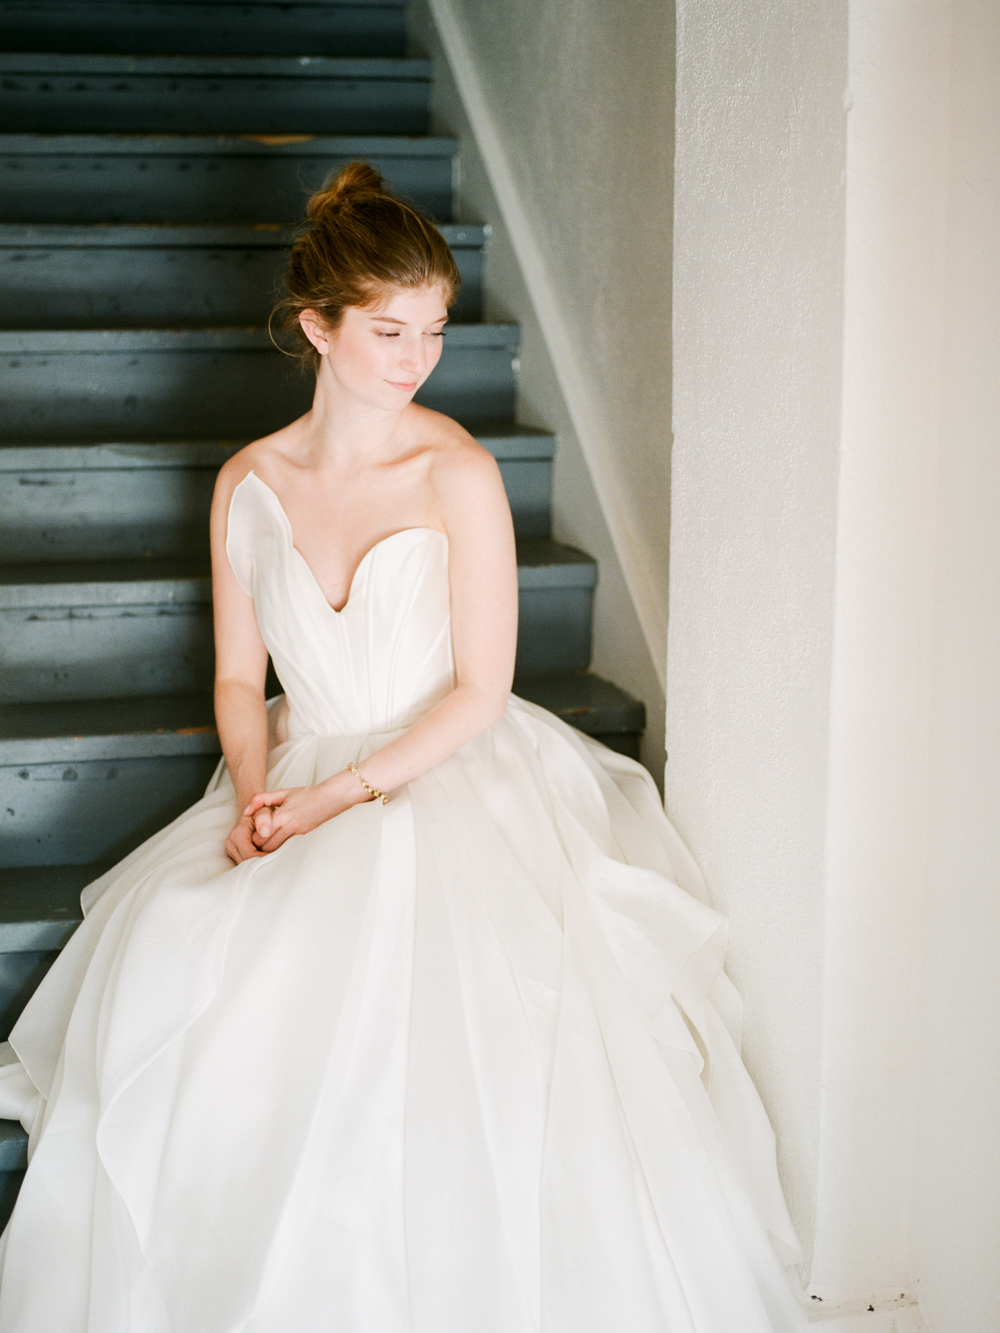 Christine Gosch_Houston wedding photographer_wedding dress styles_Houston wedding boutique_Marchesa wedding dress_ Tara Lauren bridal wedding dress_Alexandra Grecco-15.jpg